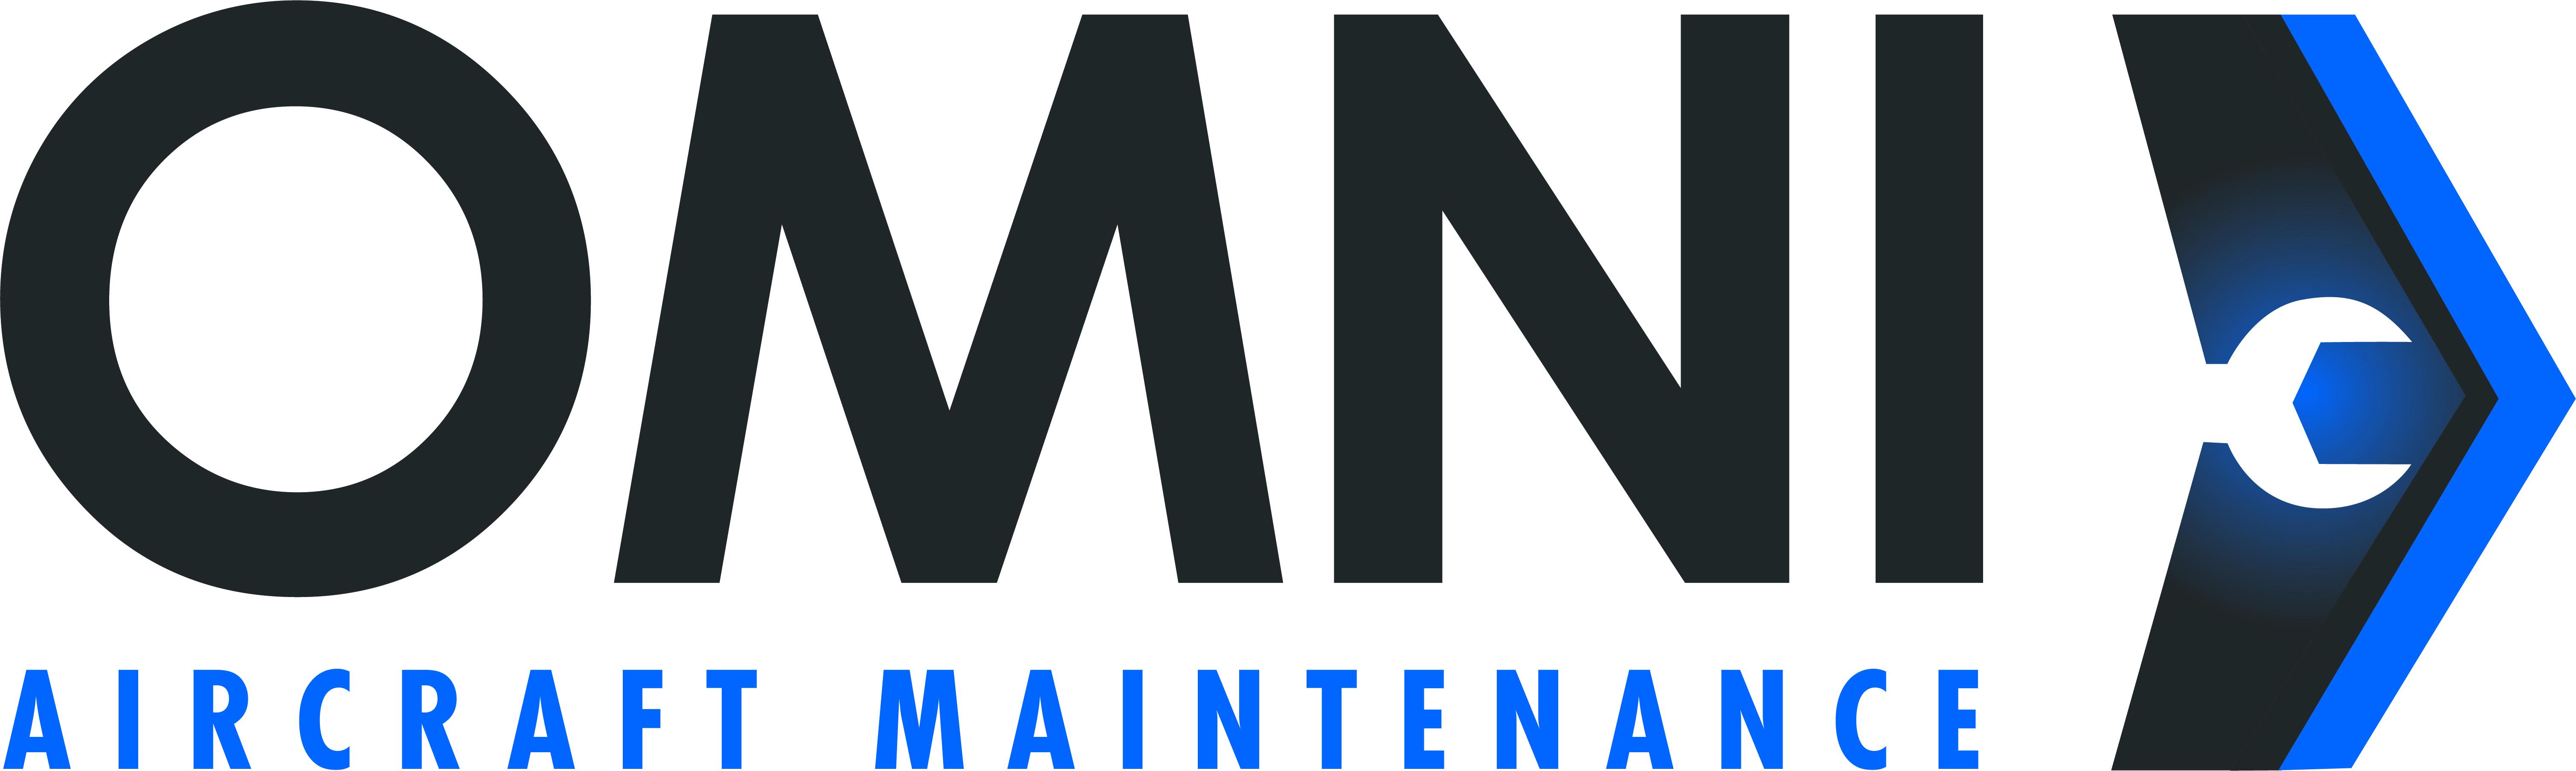 Omni Aircraft Maintenance logo